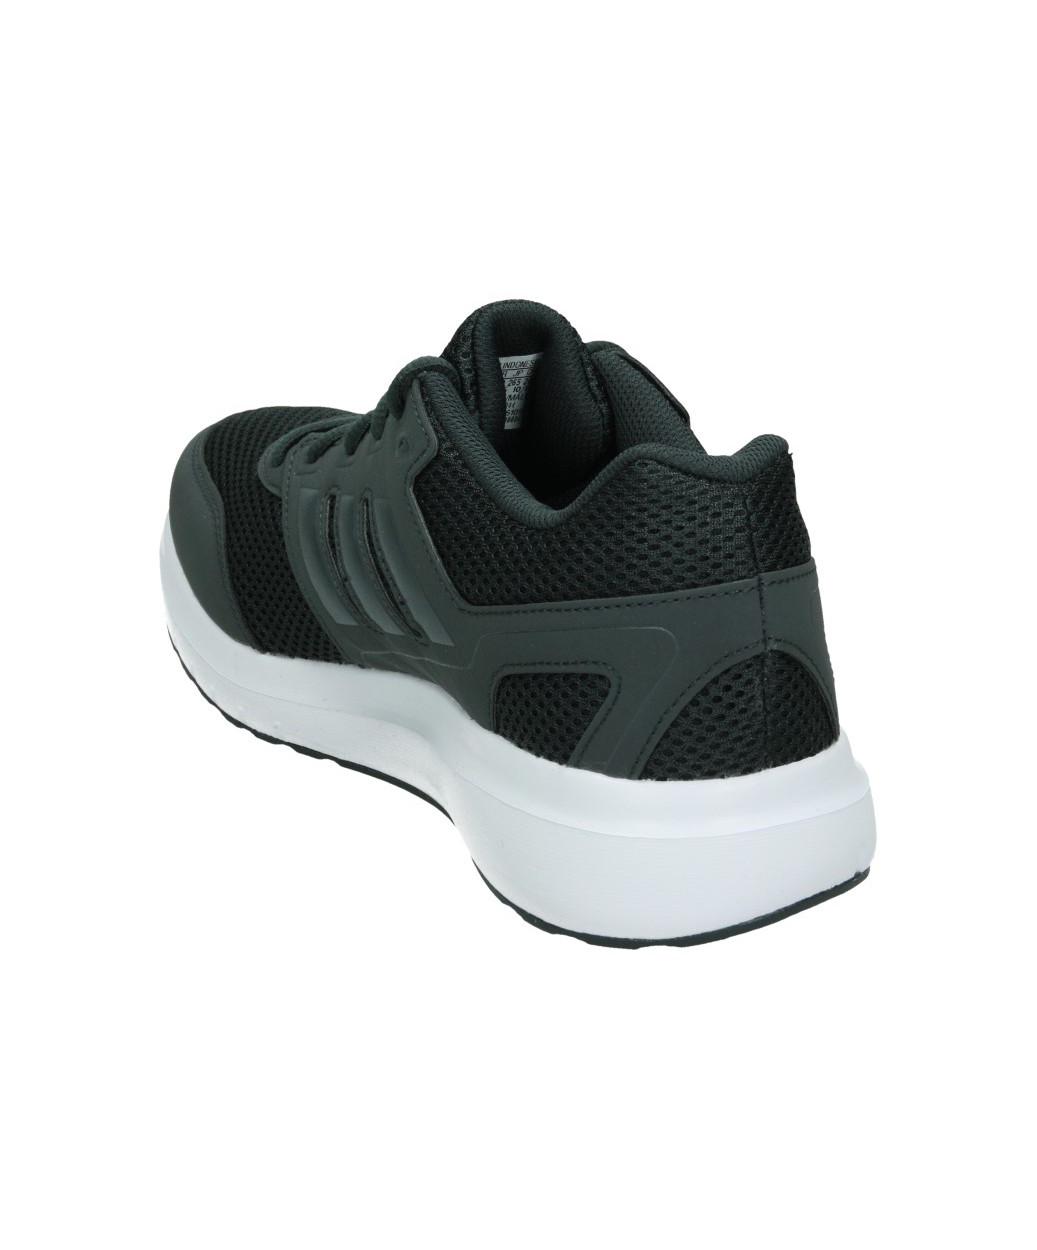 scarpe adidas duramo lite